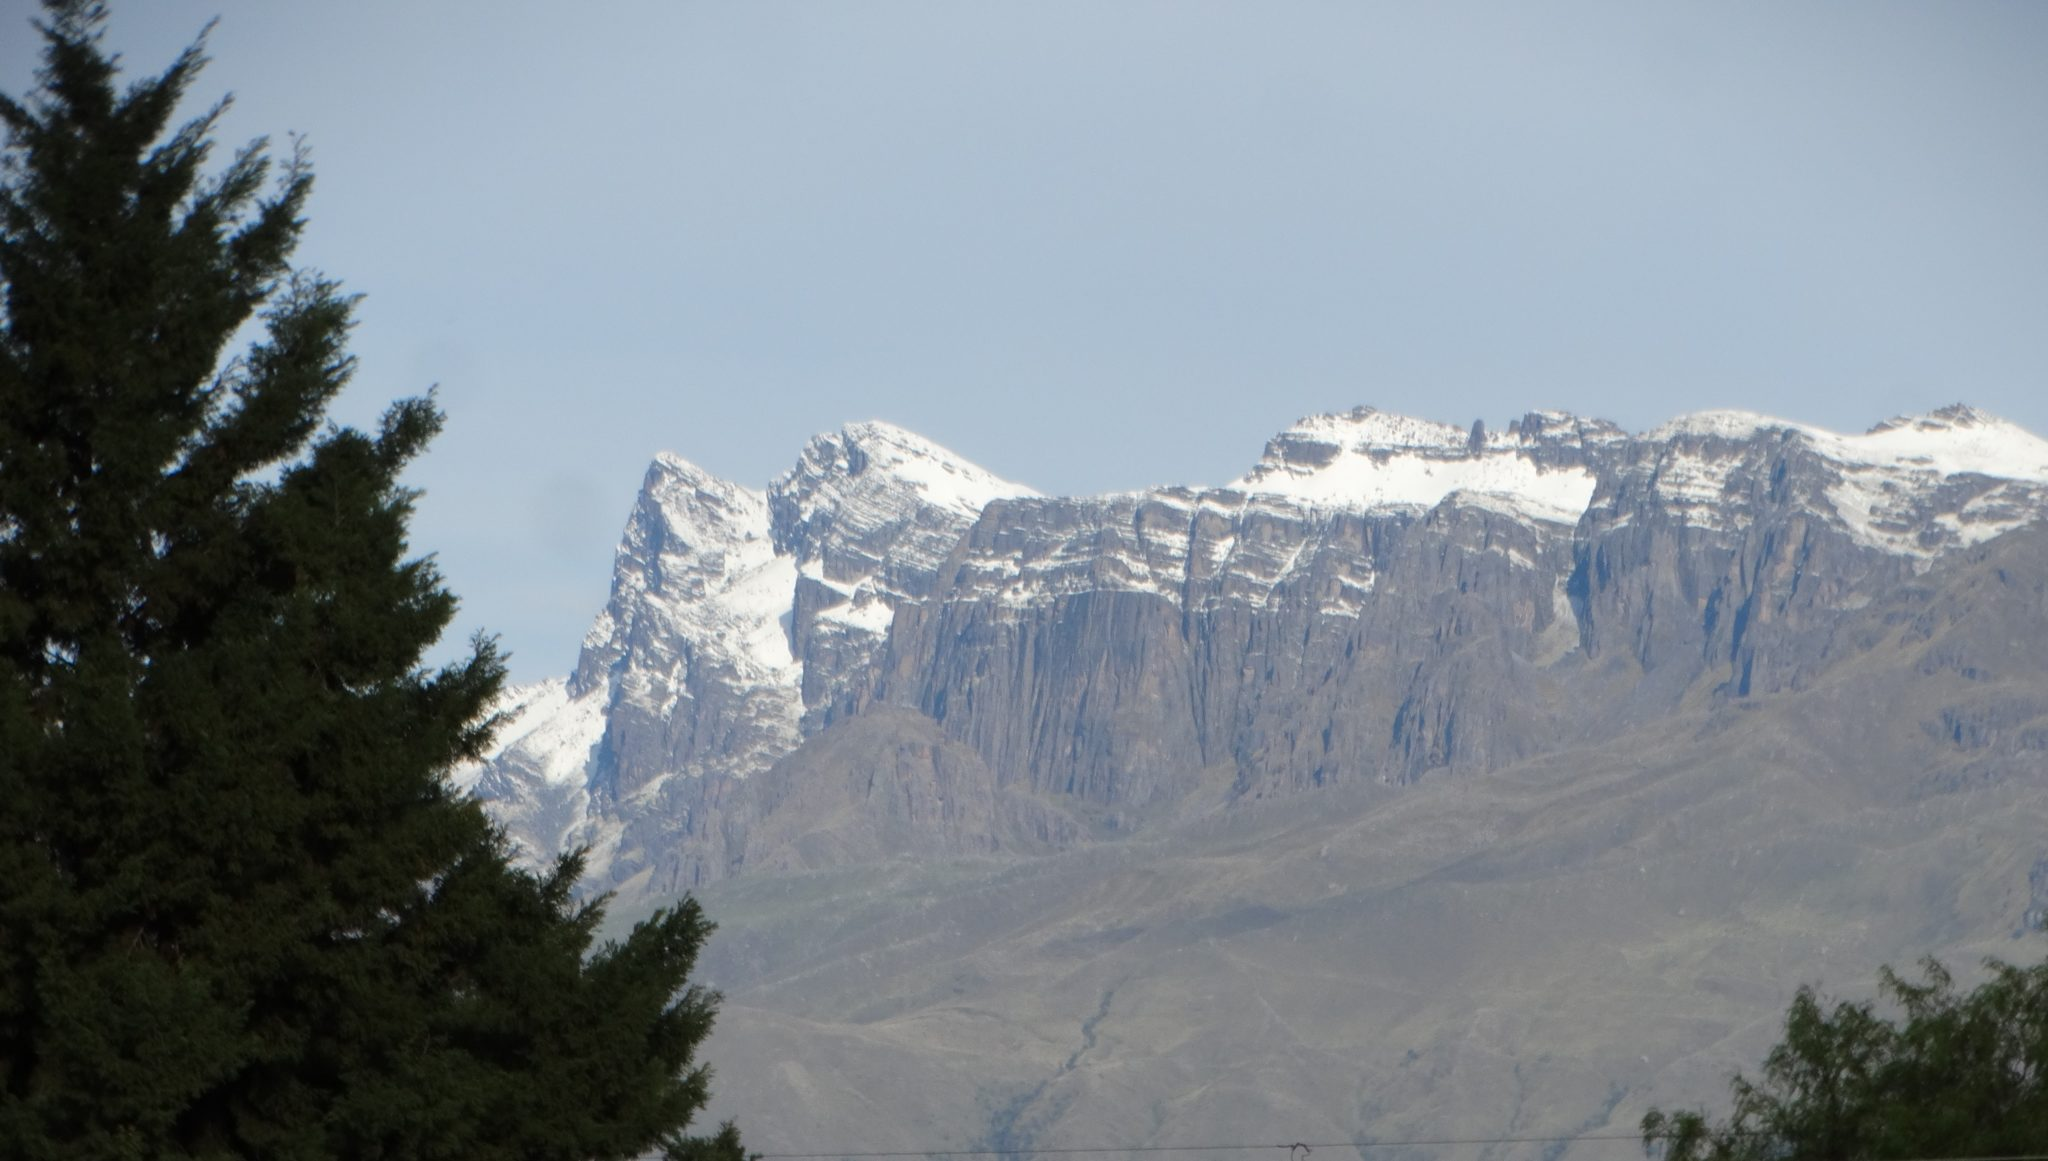 Widok z mojego okna na ośnieżone góry